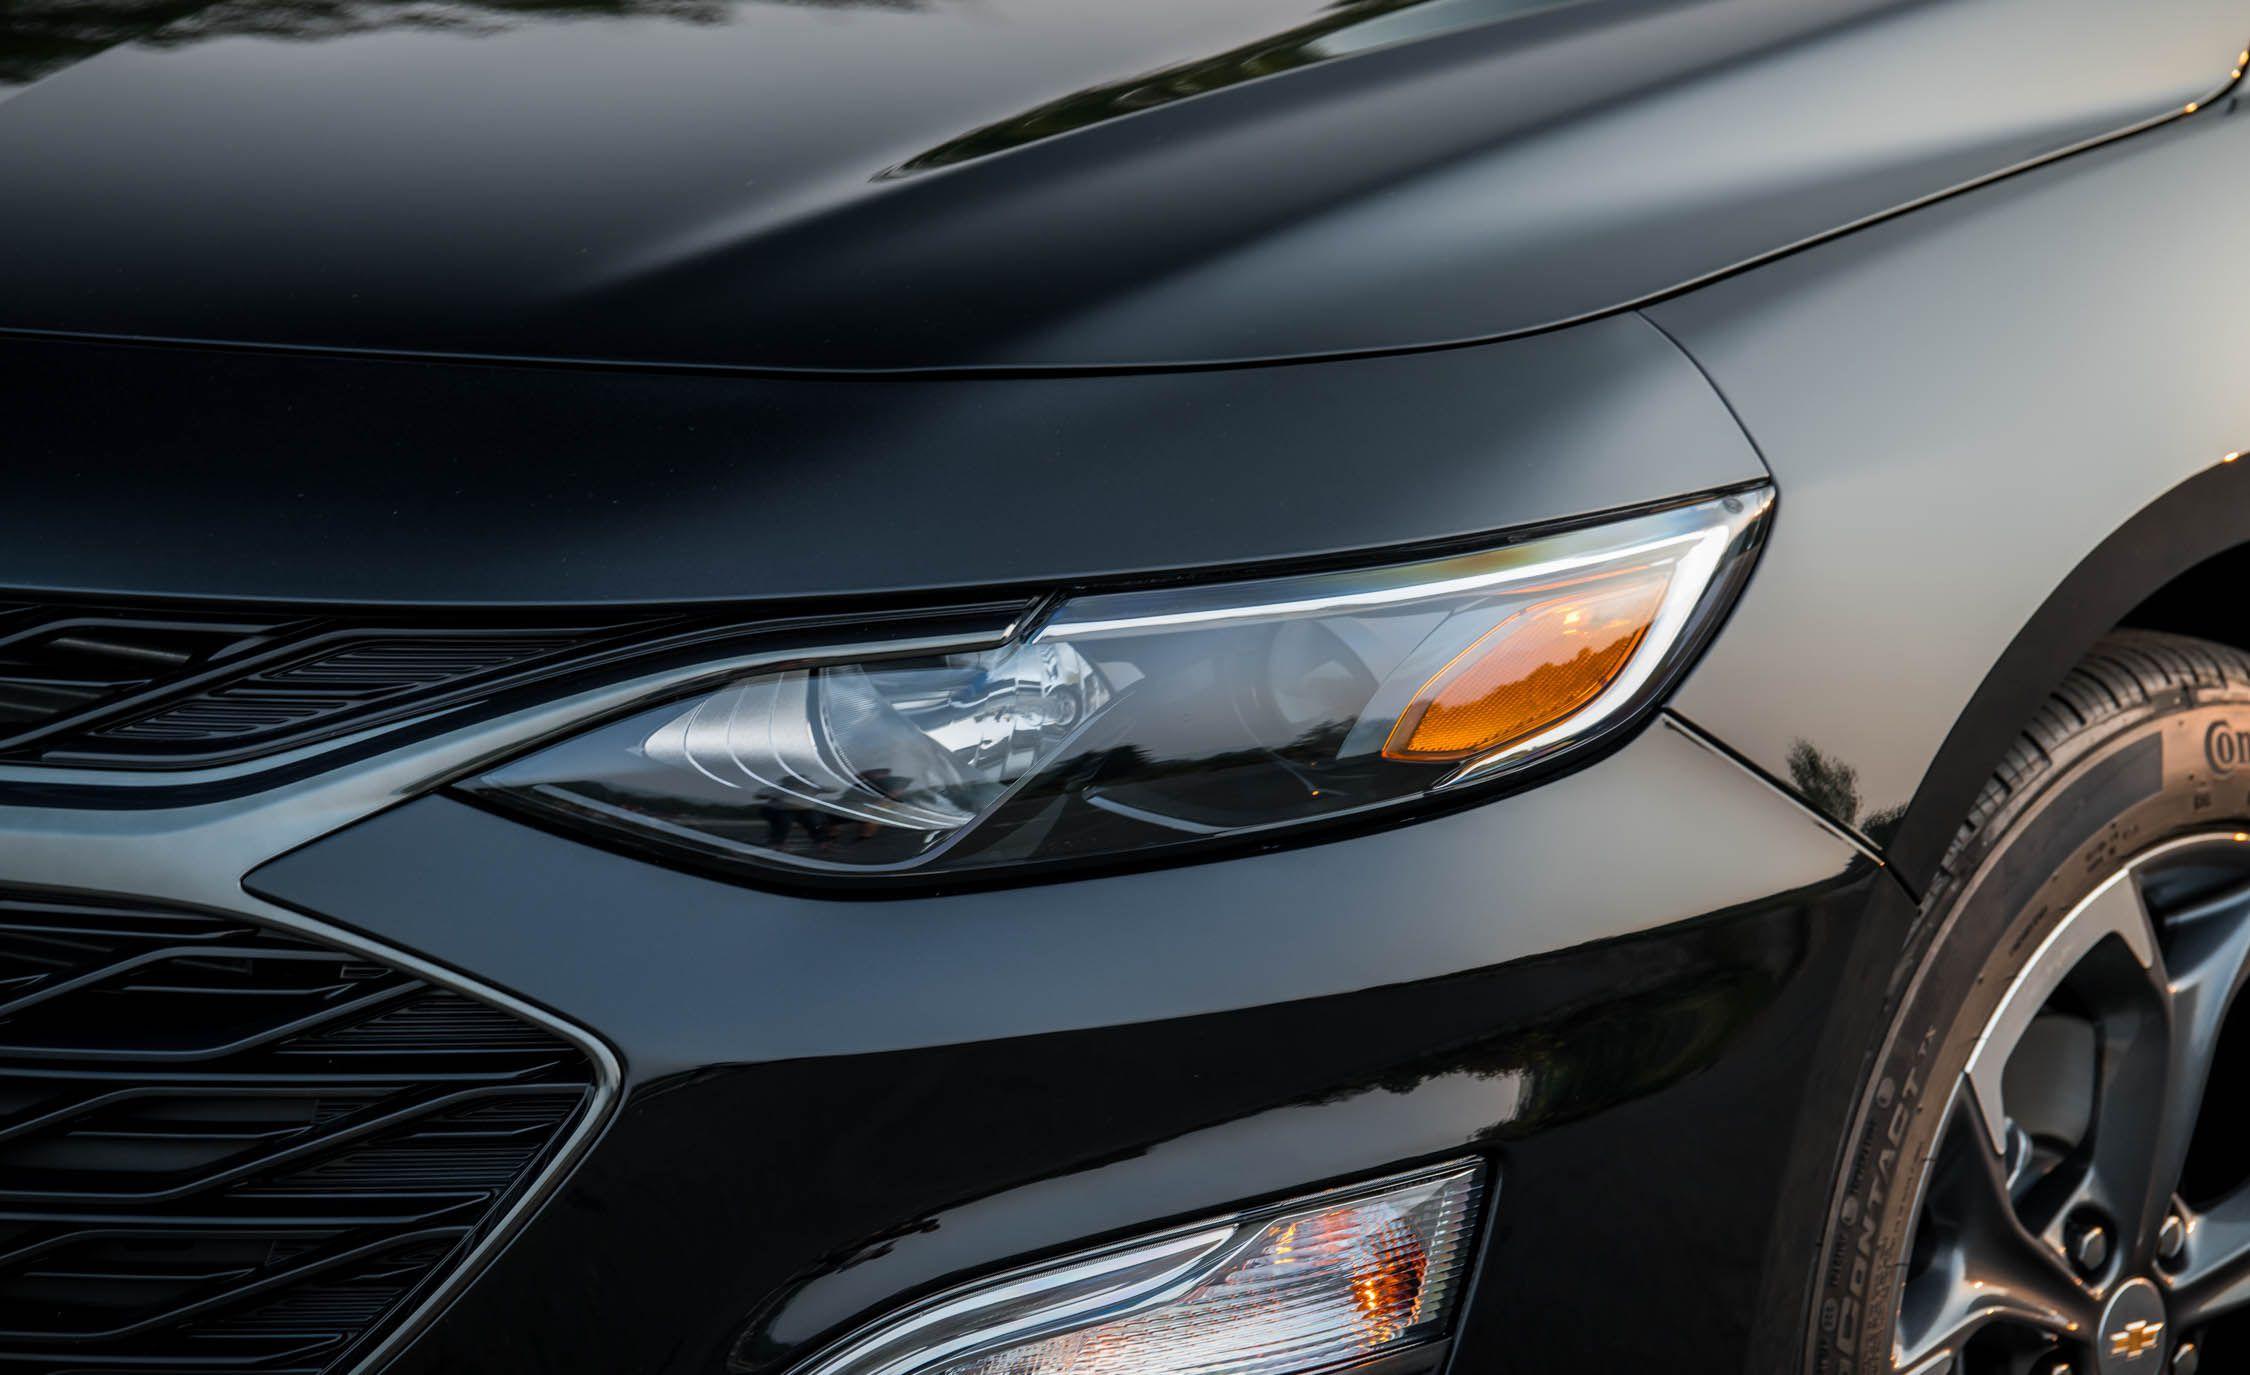 2019 Chevrolet Malibu RS Headlight Wallpaper (14)